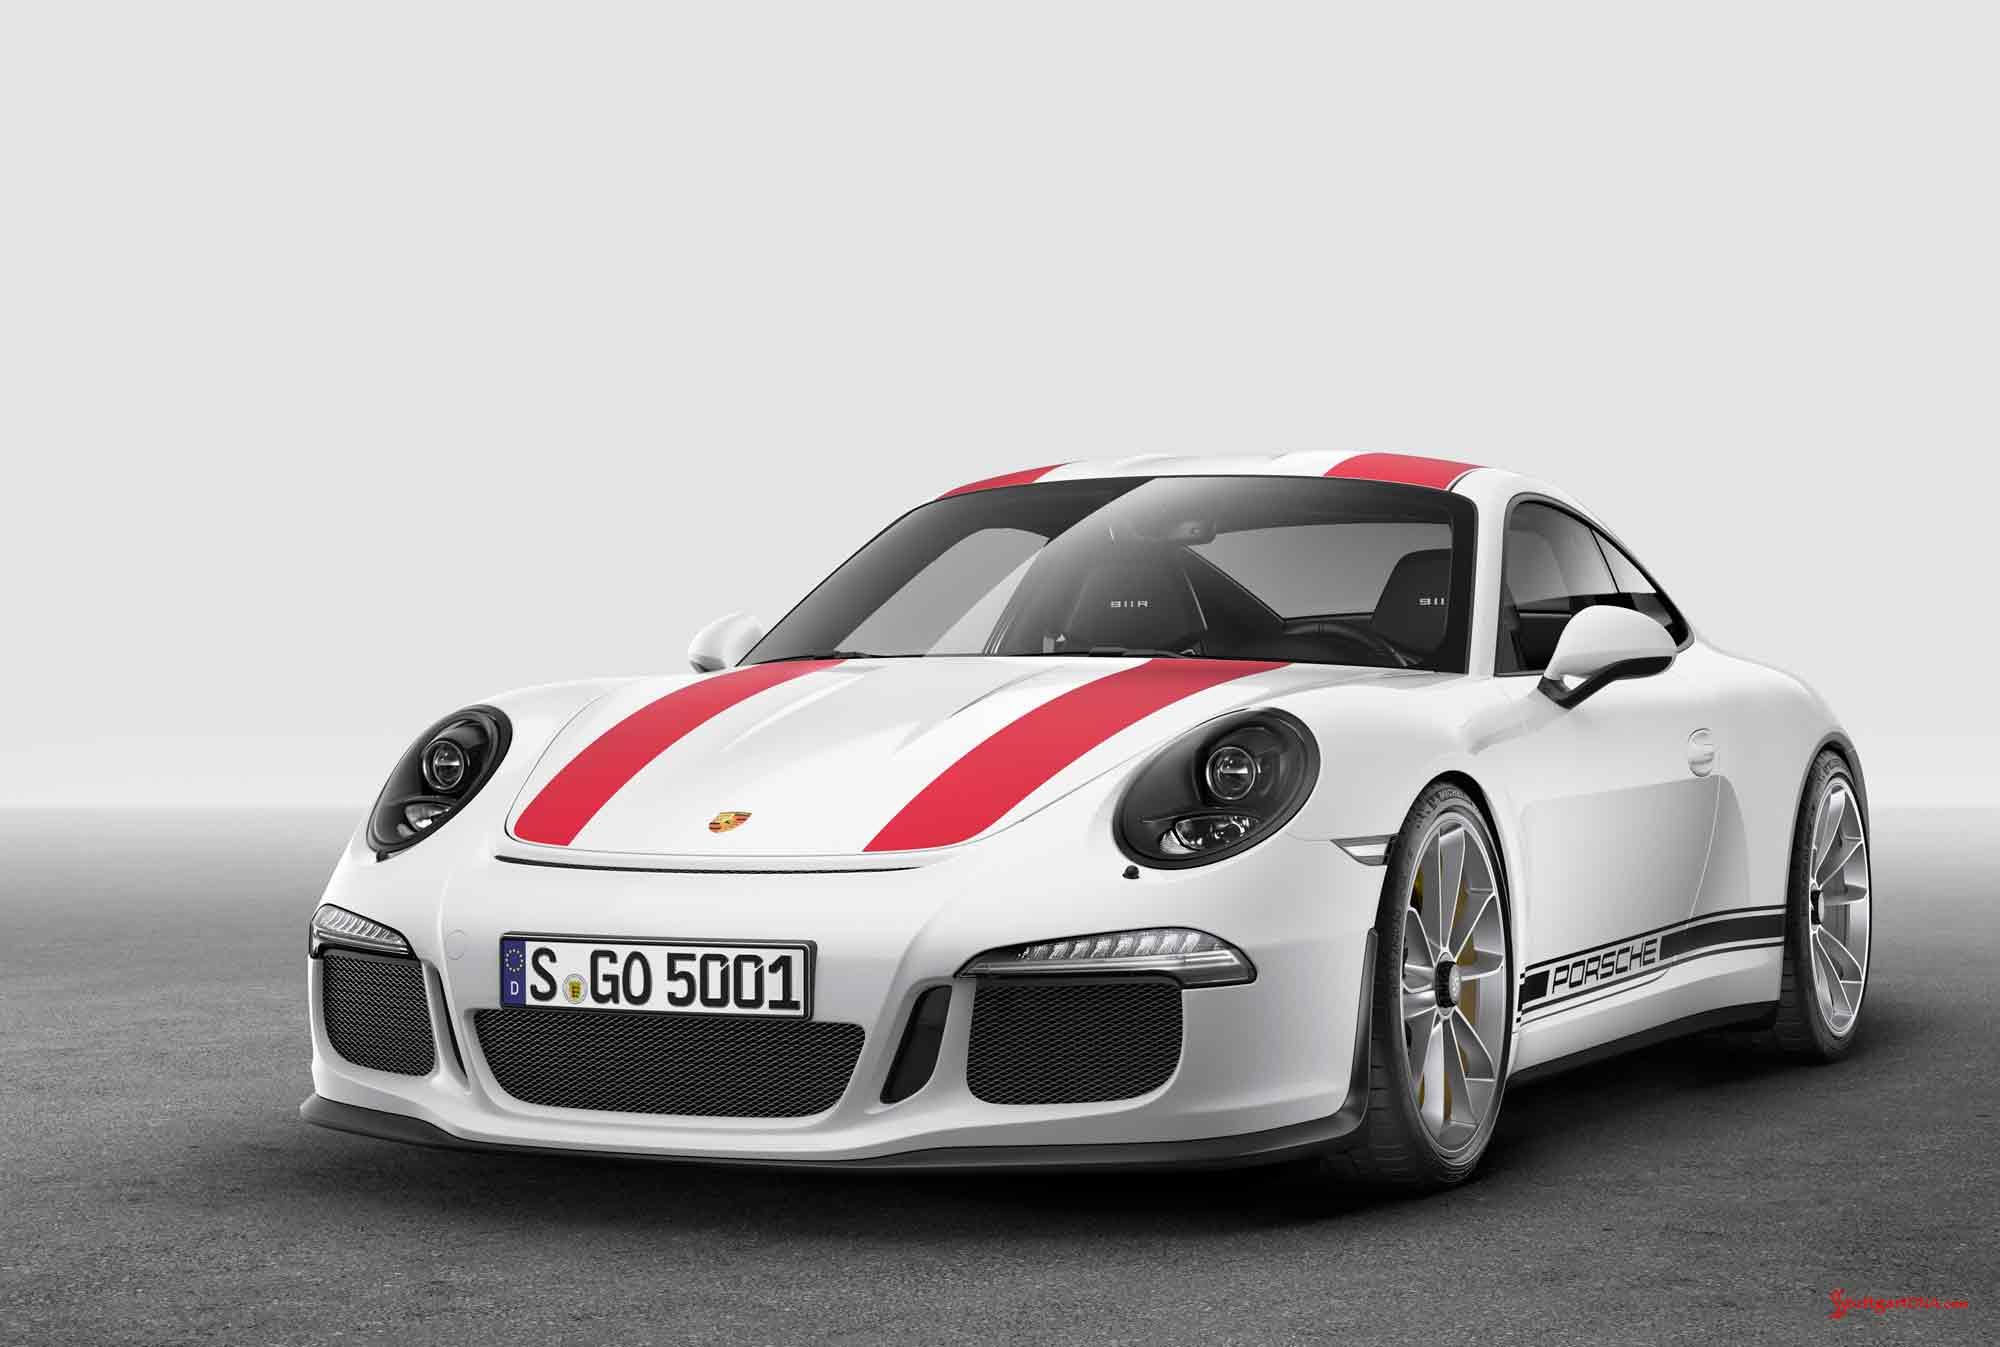 2016-911-R-left-front-at-rest Mesmerizing Porsche 918 Spyder London Ontario Cars Trend